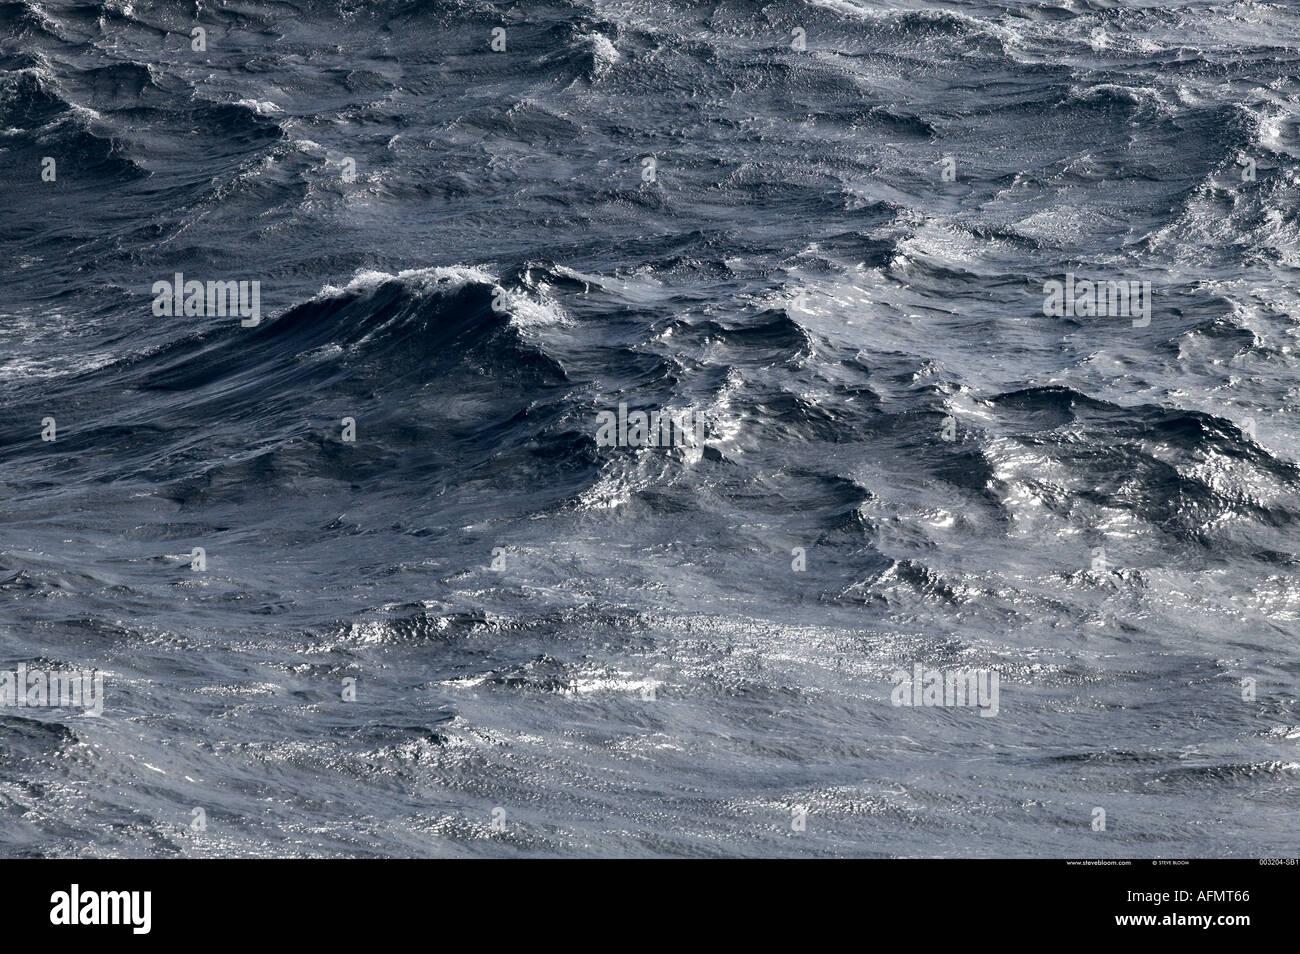 Las aguas grises del Océano Austral Imagen De Stock